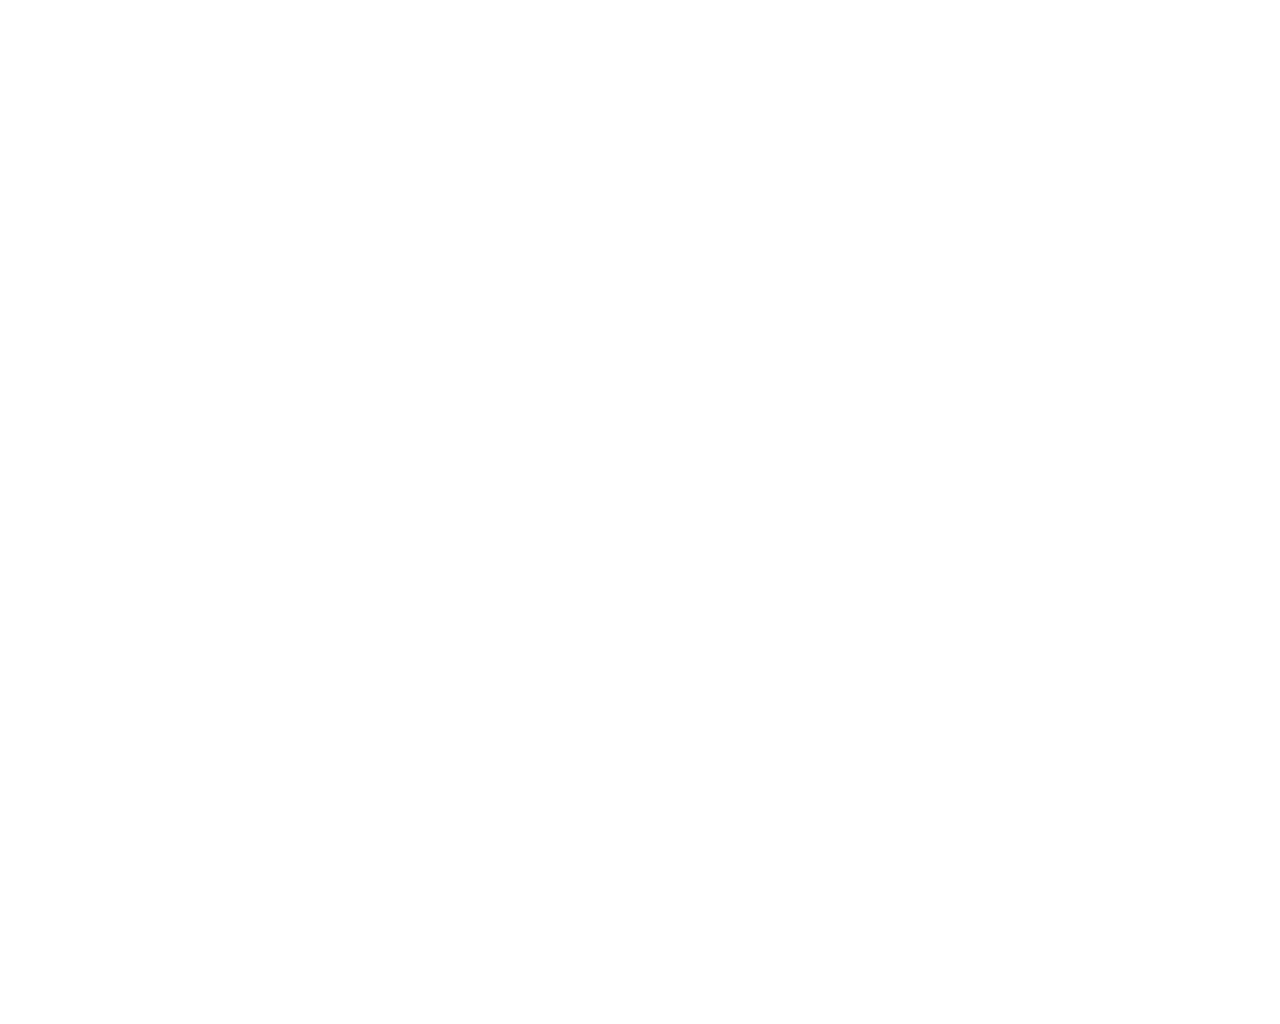 cadred.org